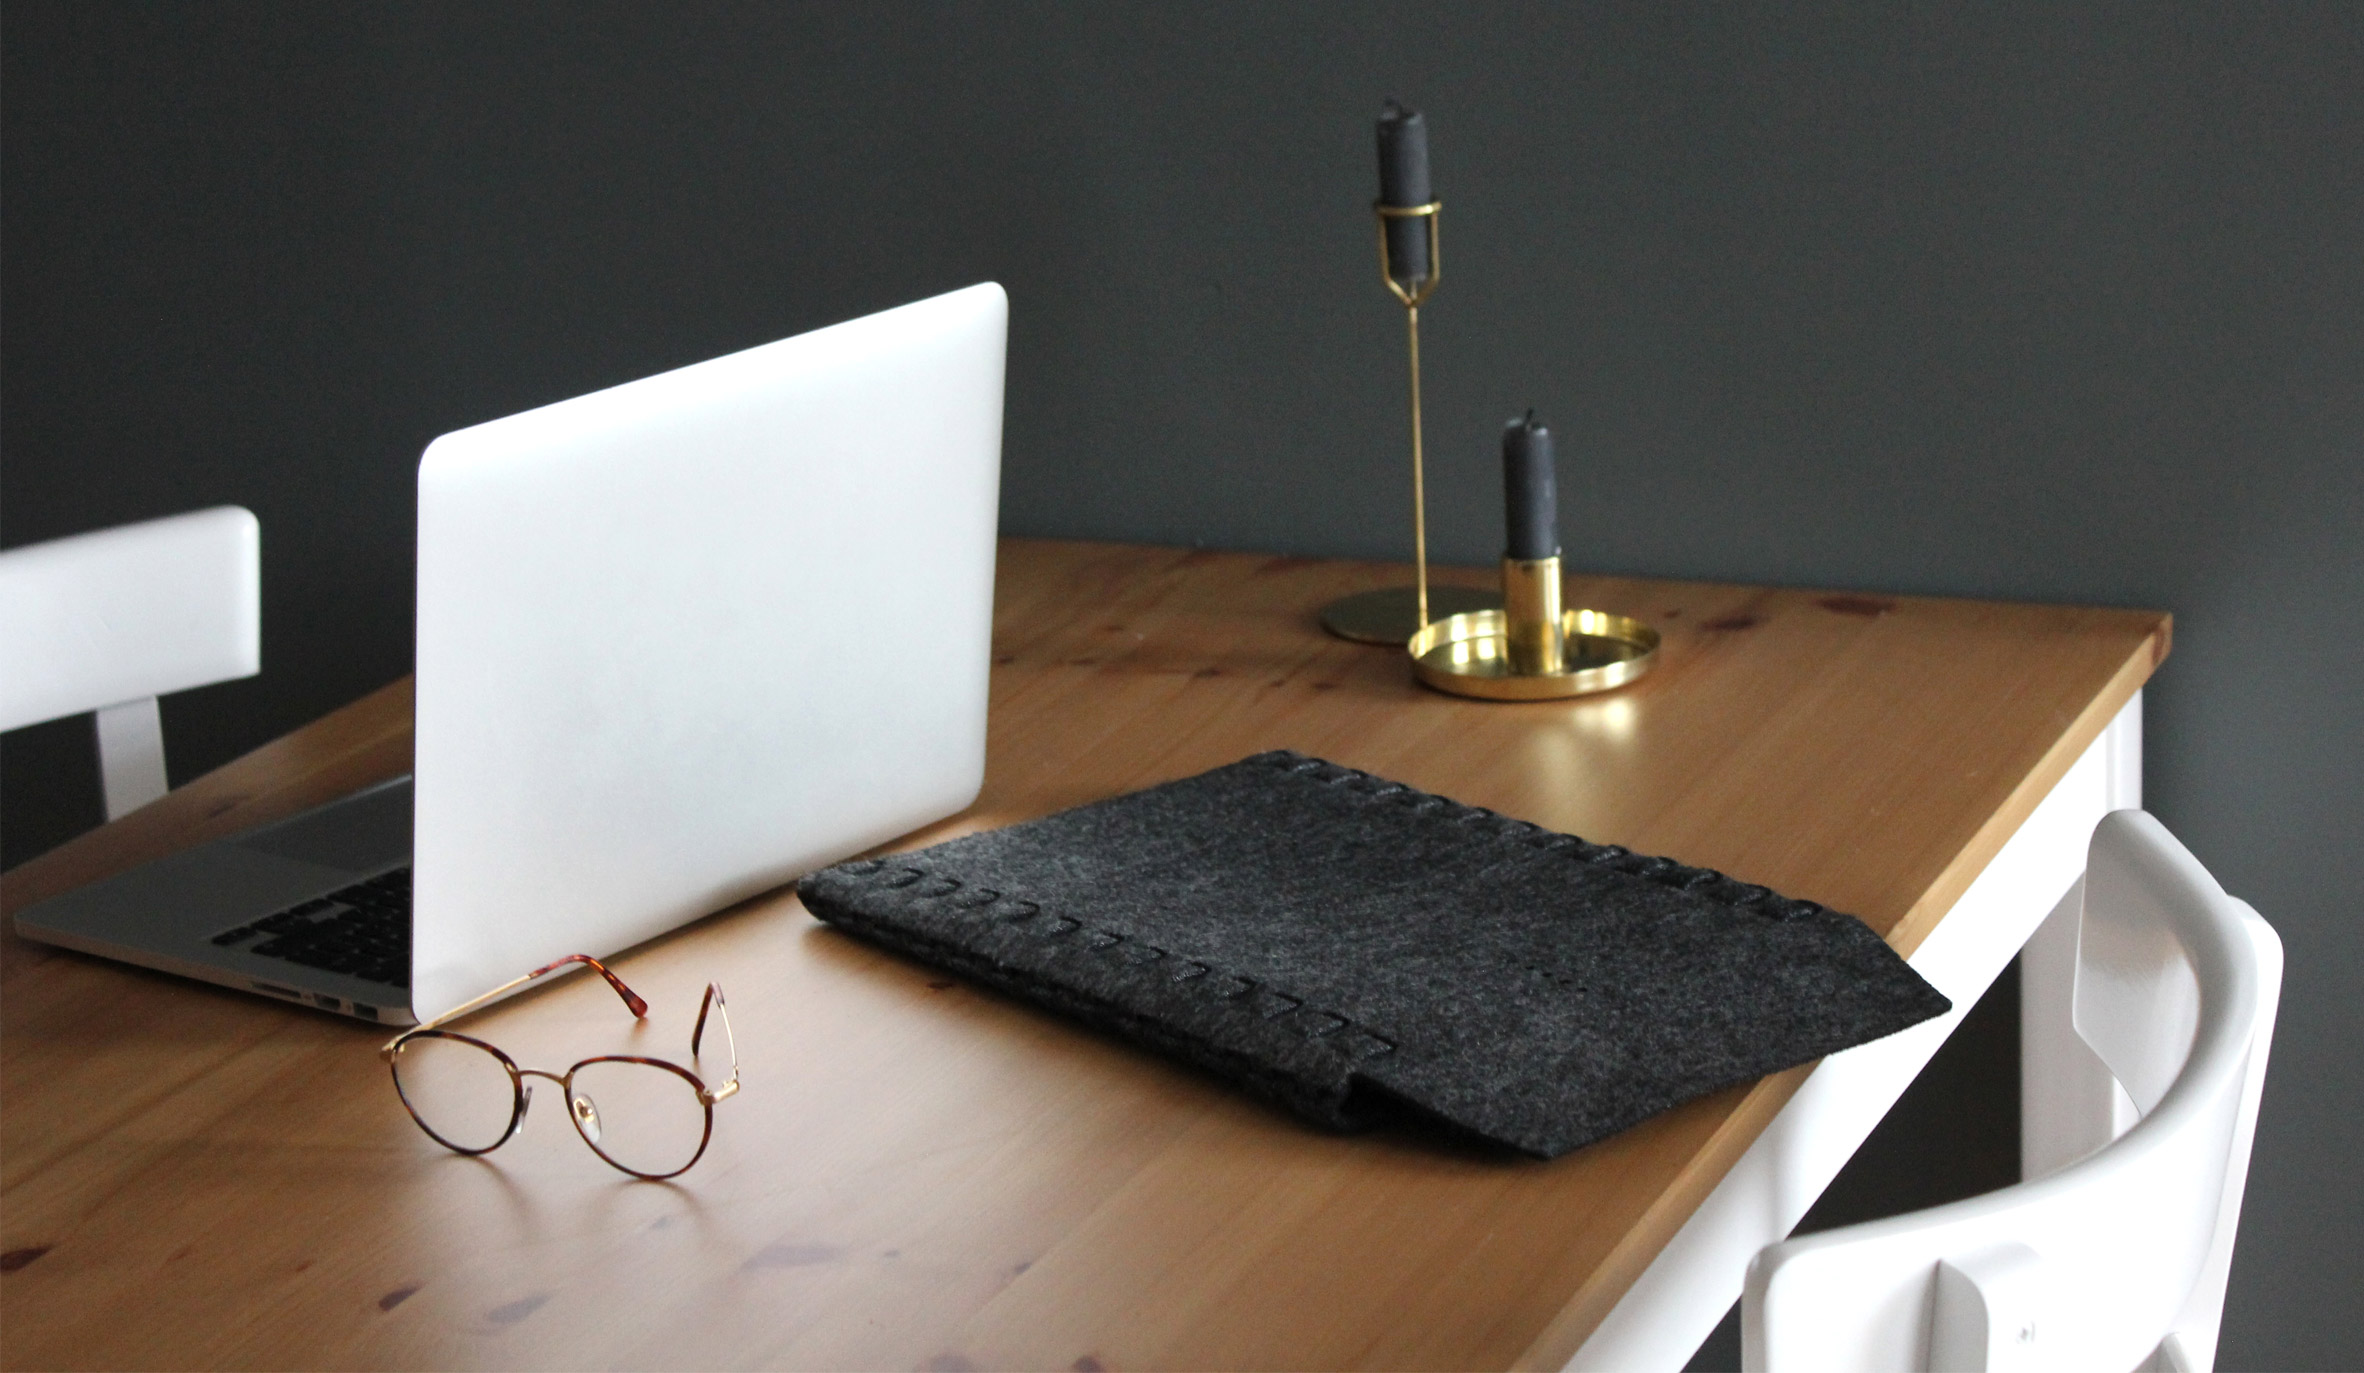 Martijn van Strien launches print-on-demand laptop sleeves to cut overproduction